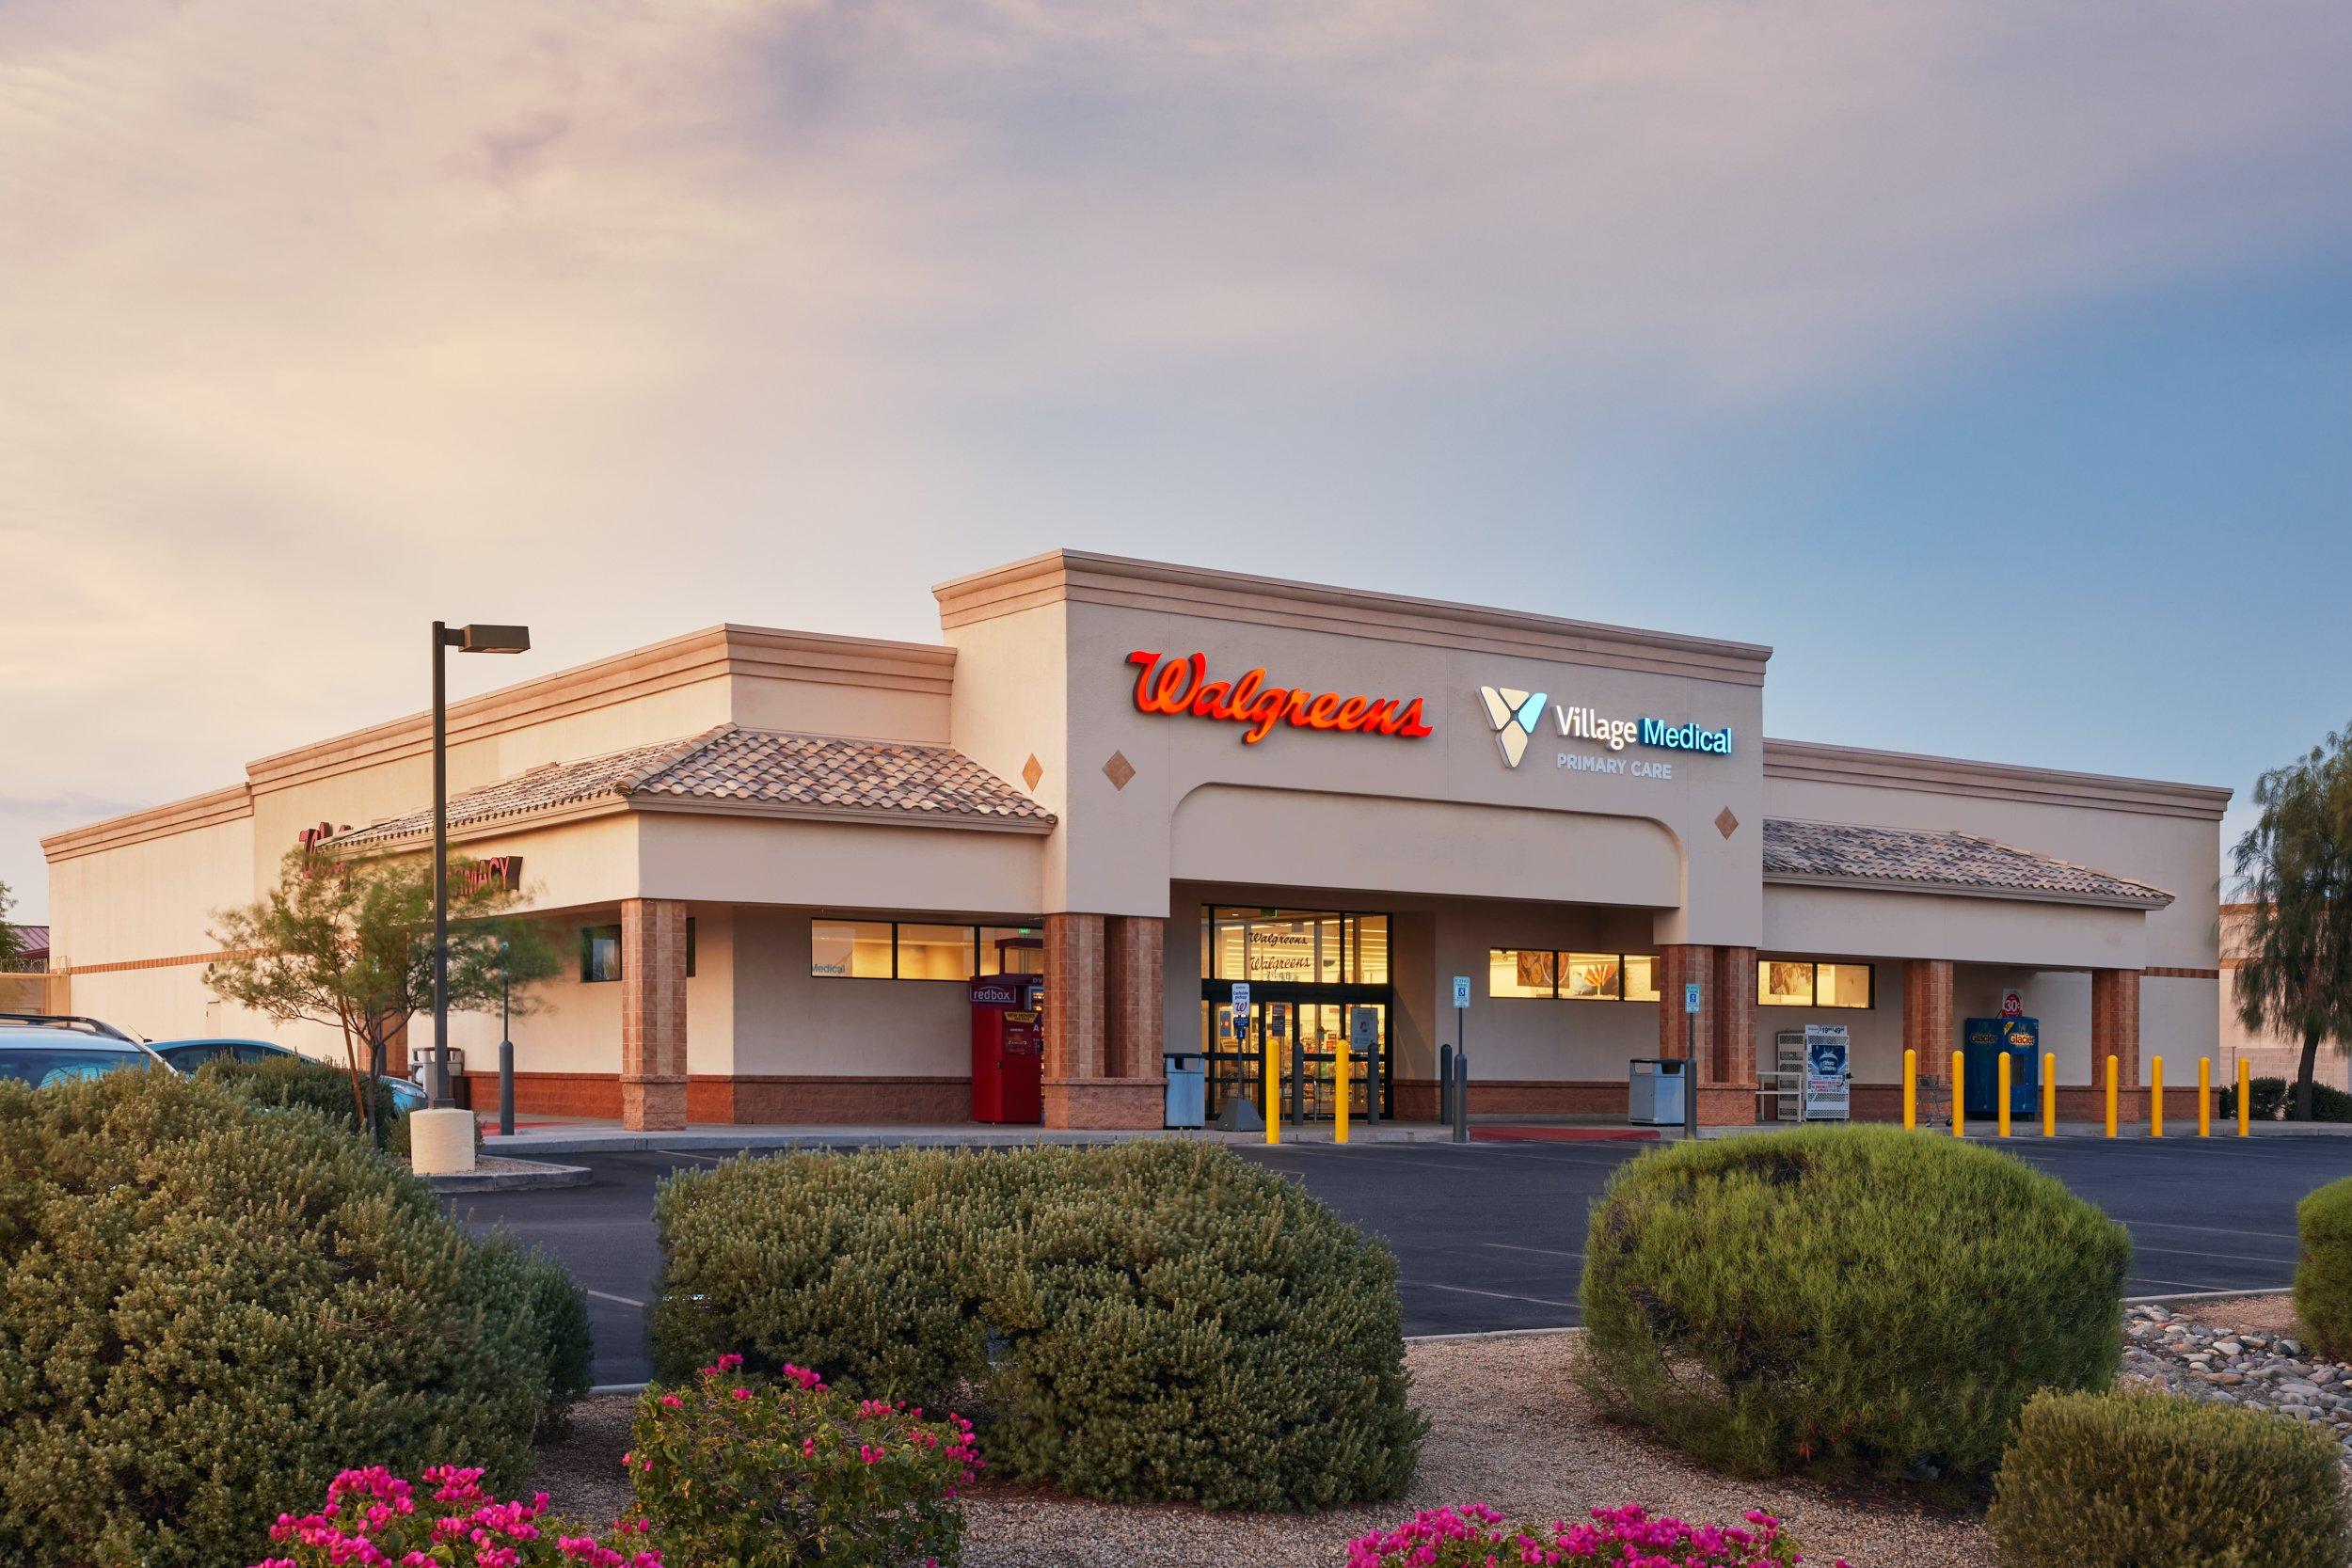 Village Medical at Walgreens - 7448 W. Thunderbird Rd. , Suite 105 Peoria, AZ, 85381.